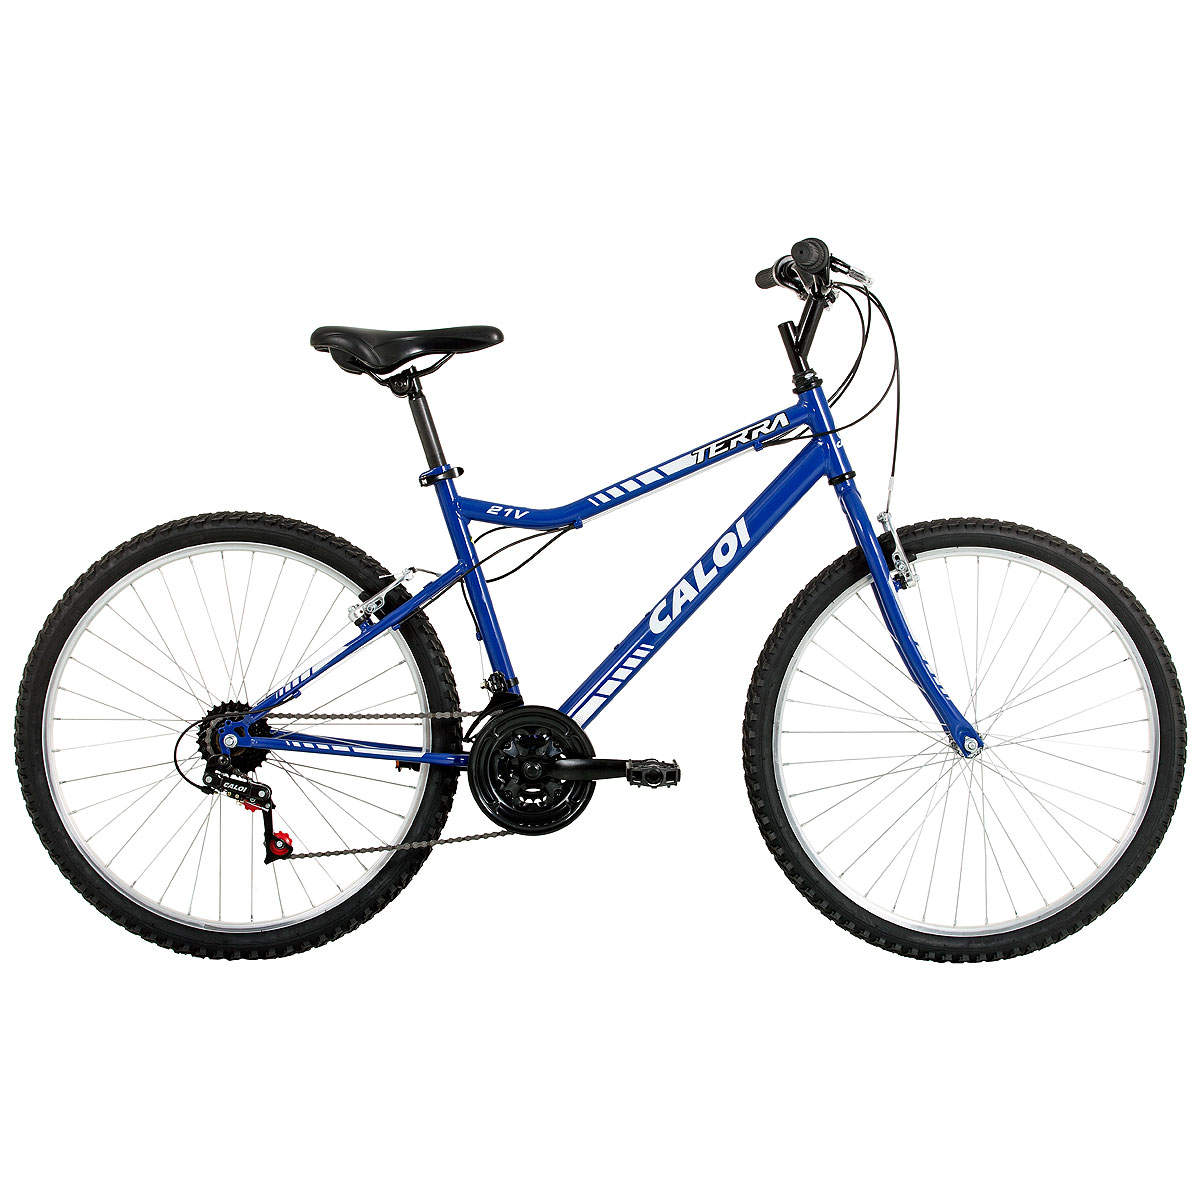 Centauro: Bicicleta Caloi Terra com 11% de desconto + 5% no boleto